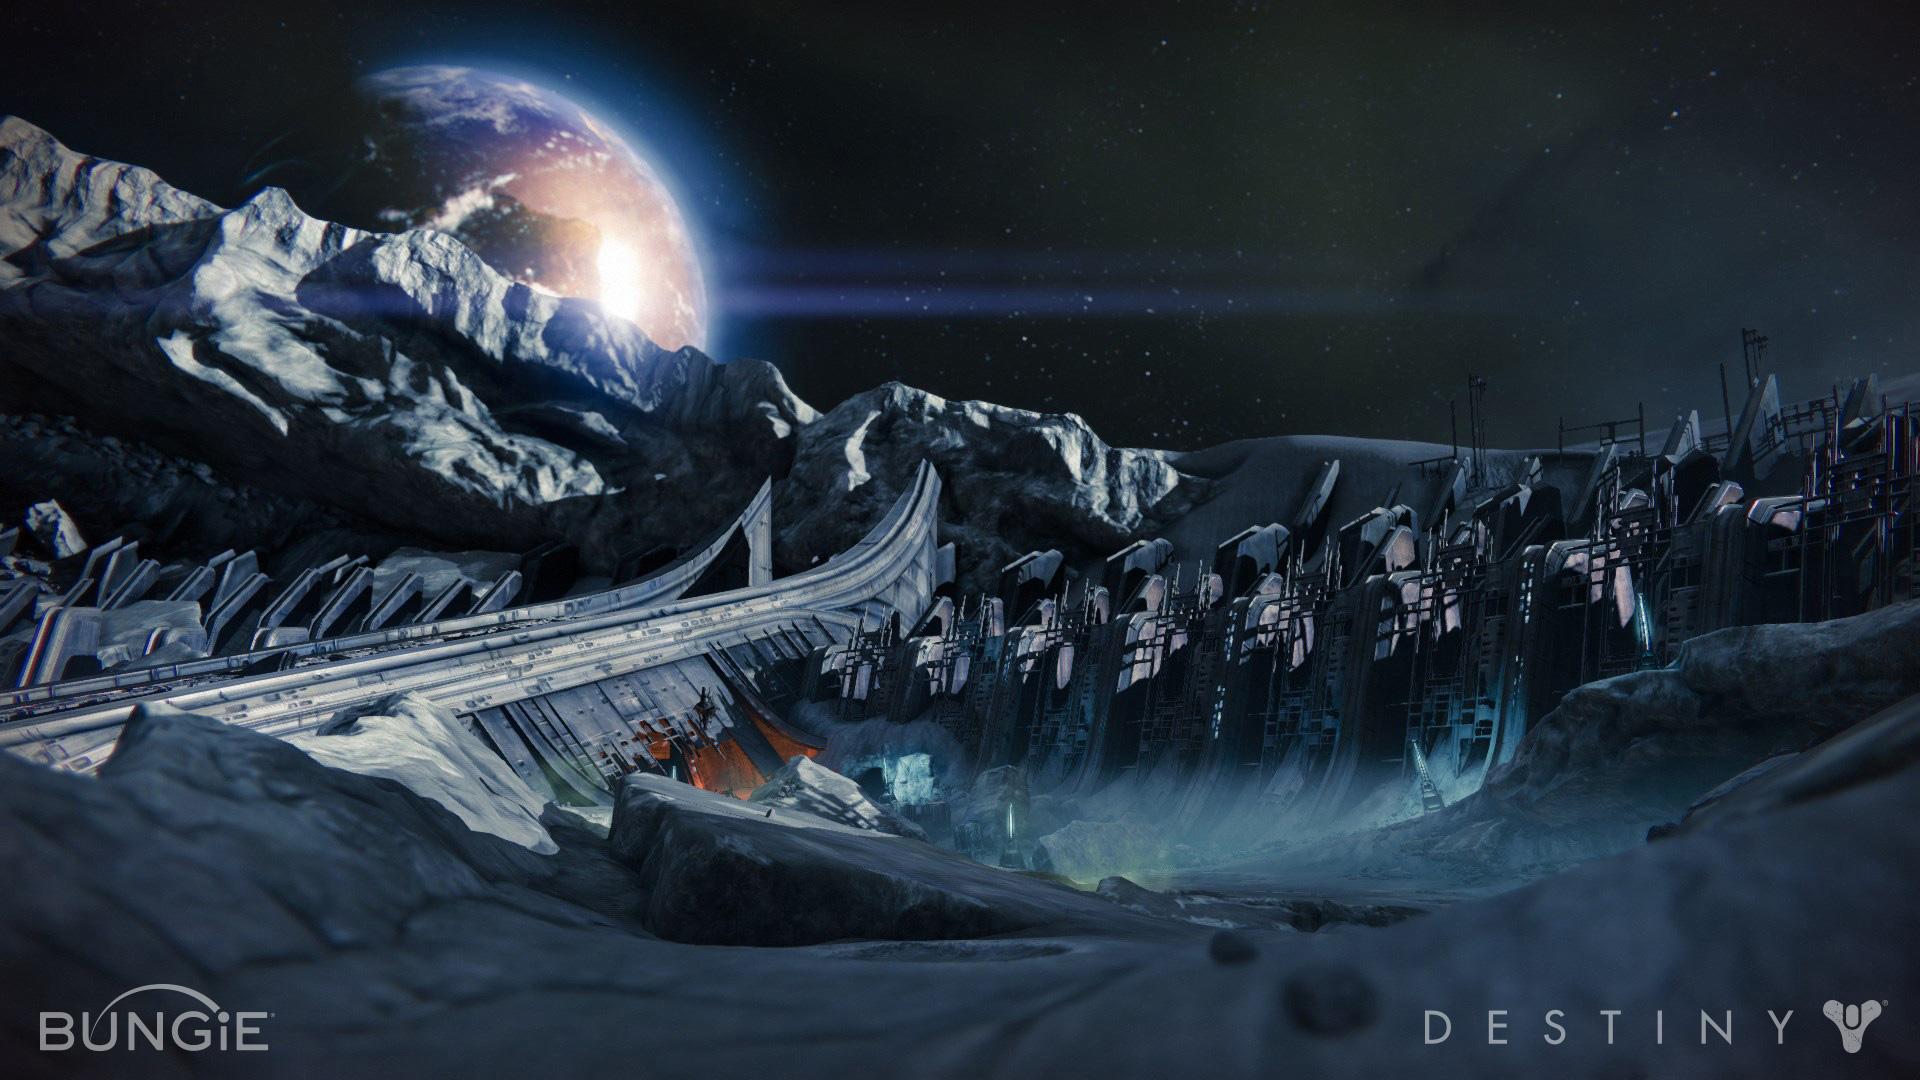 Destiny wallpaper bungie destiny artwork2 jpg - Destony Moon Shot